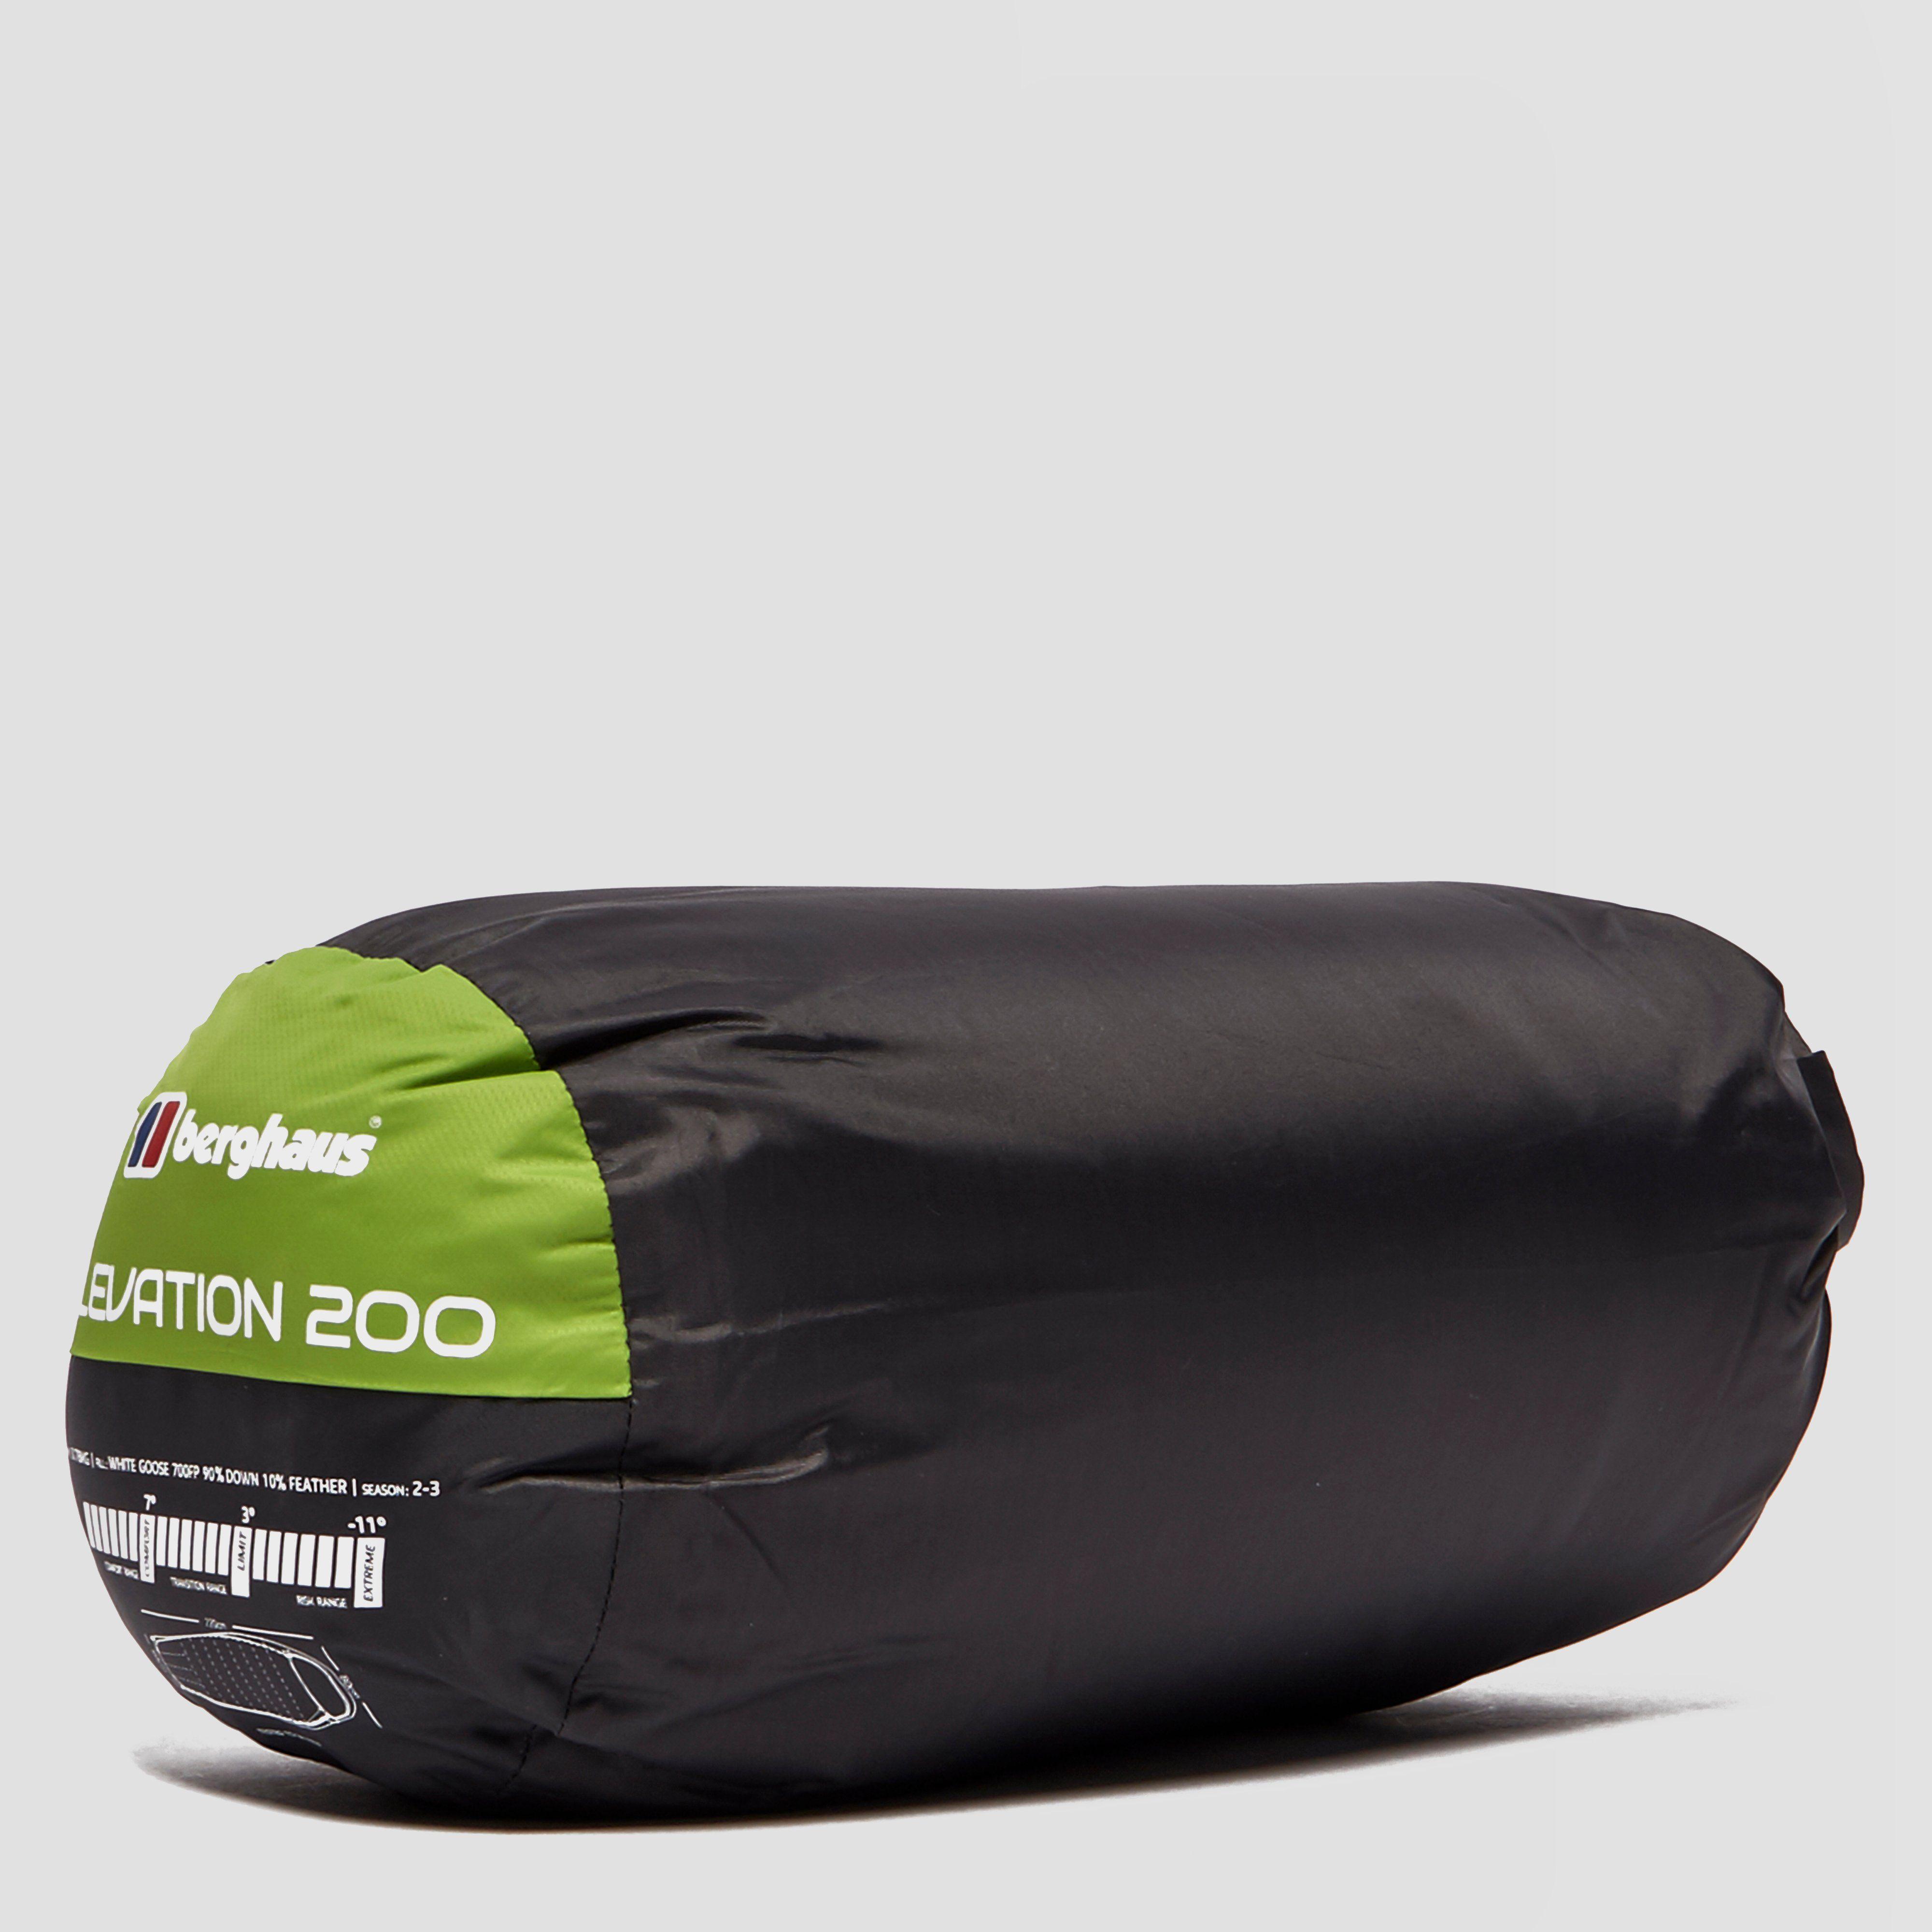 Berghaus Elevation 200 Sleeping Bag